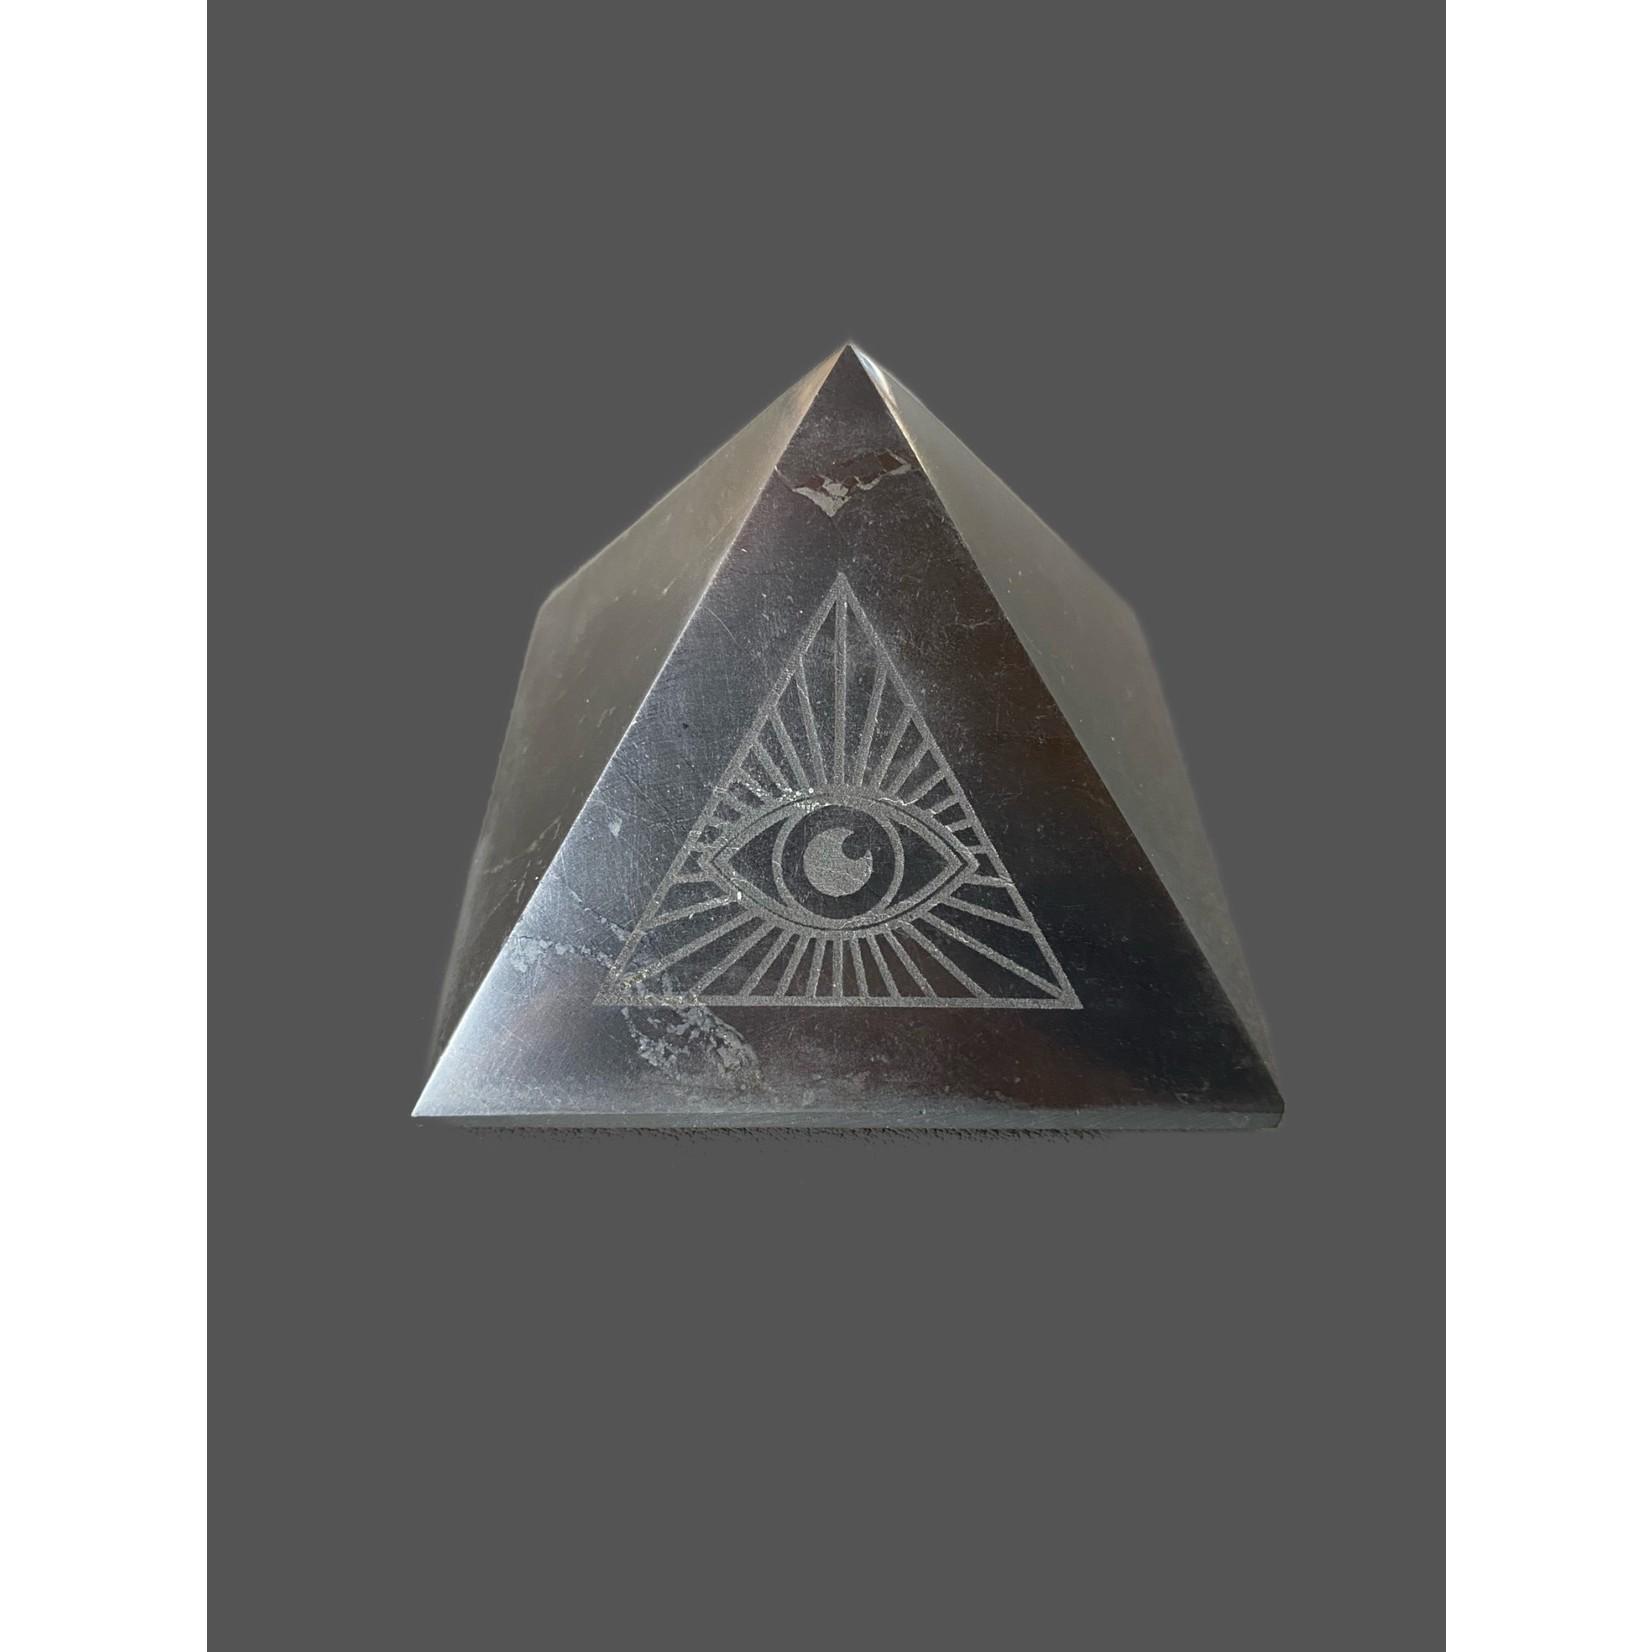 Pirámide Shungit Ojo Dios 7cm